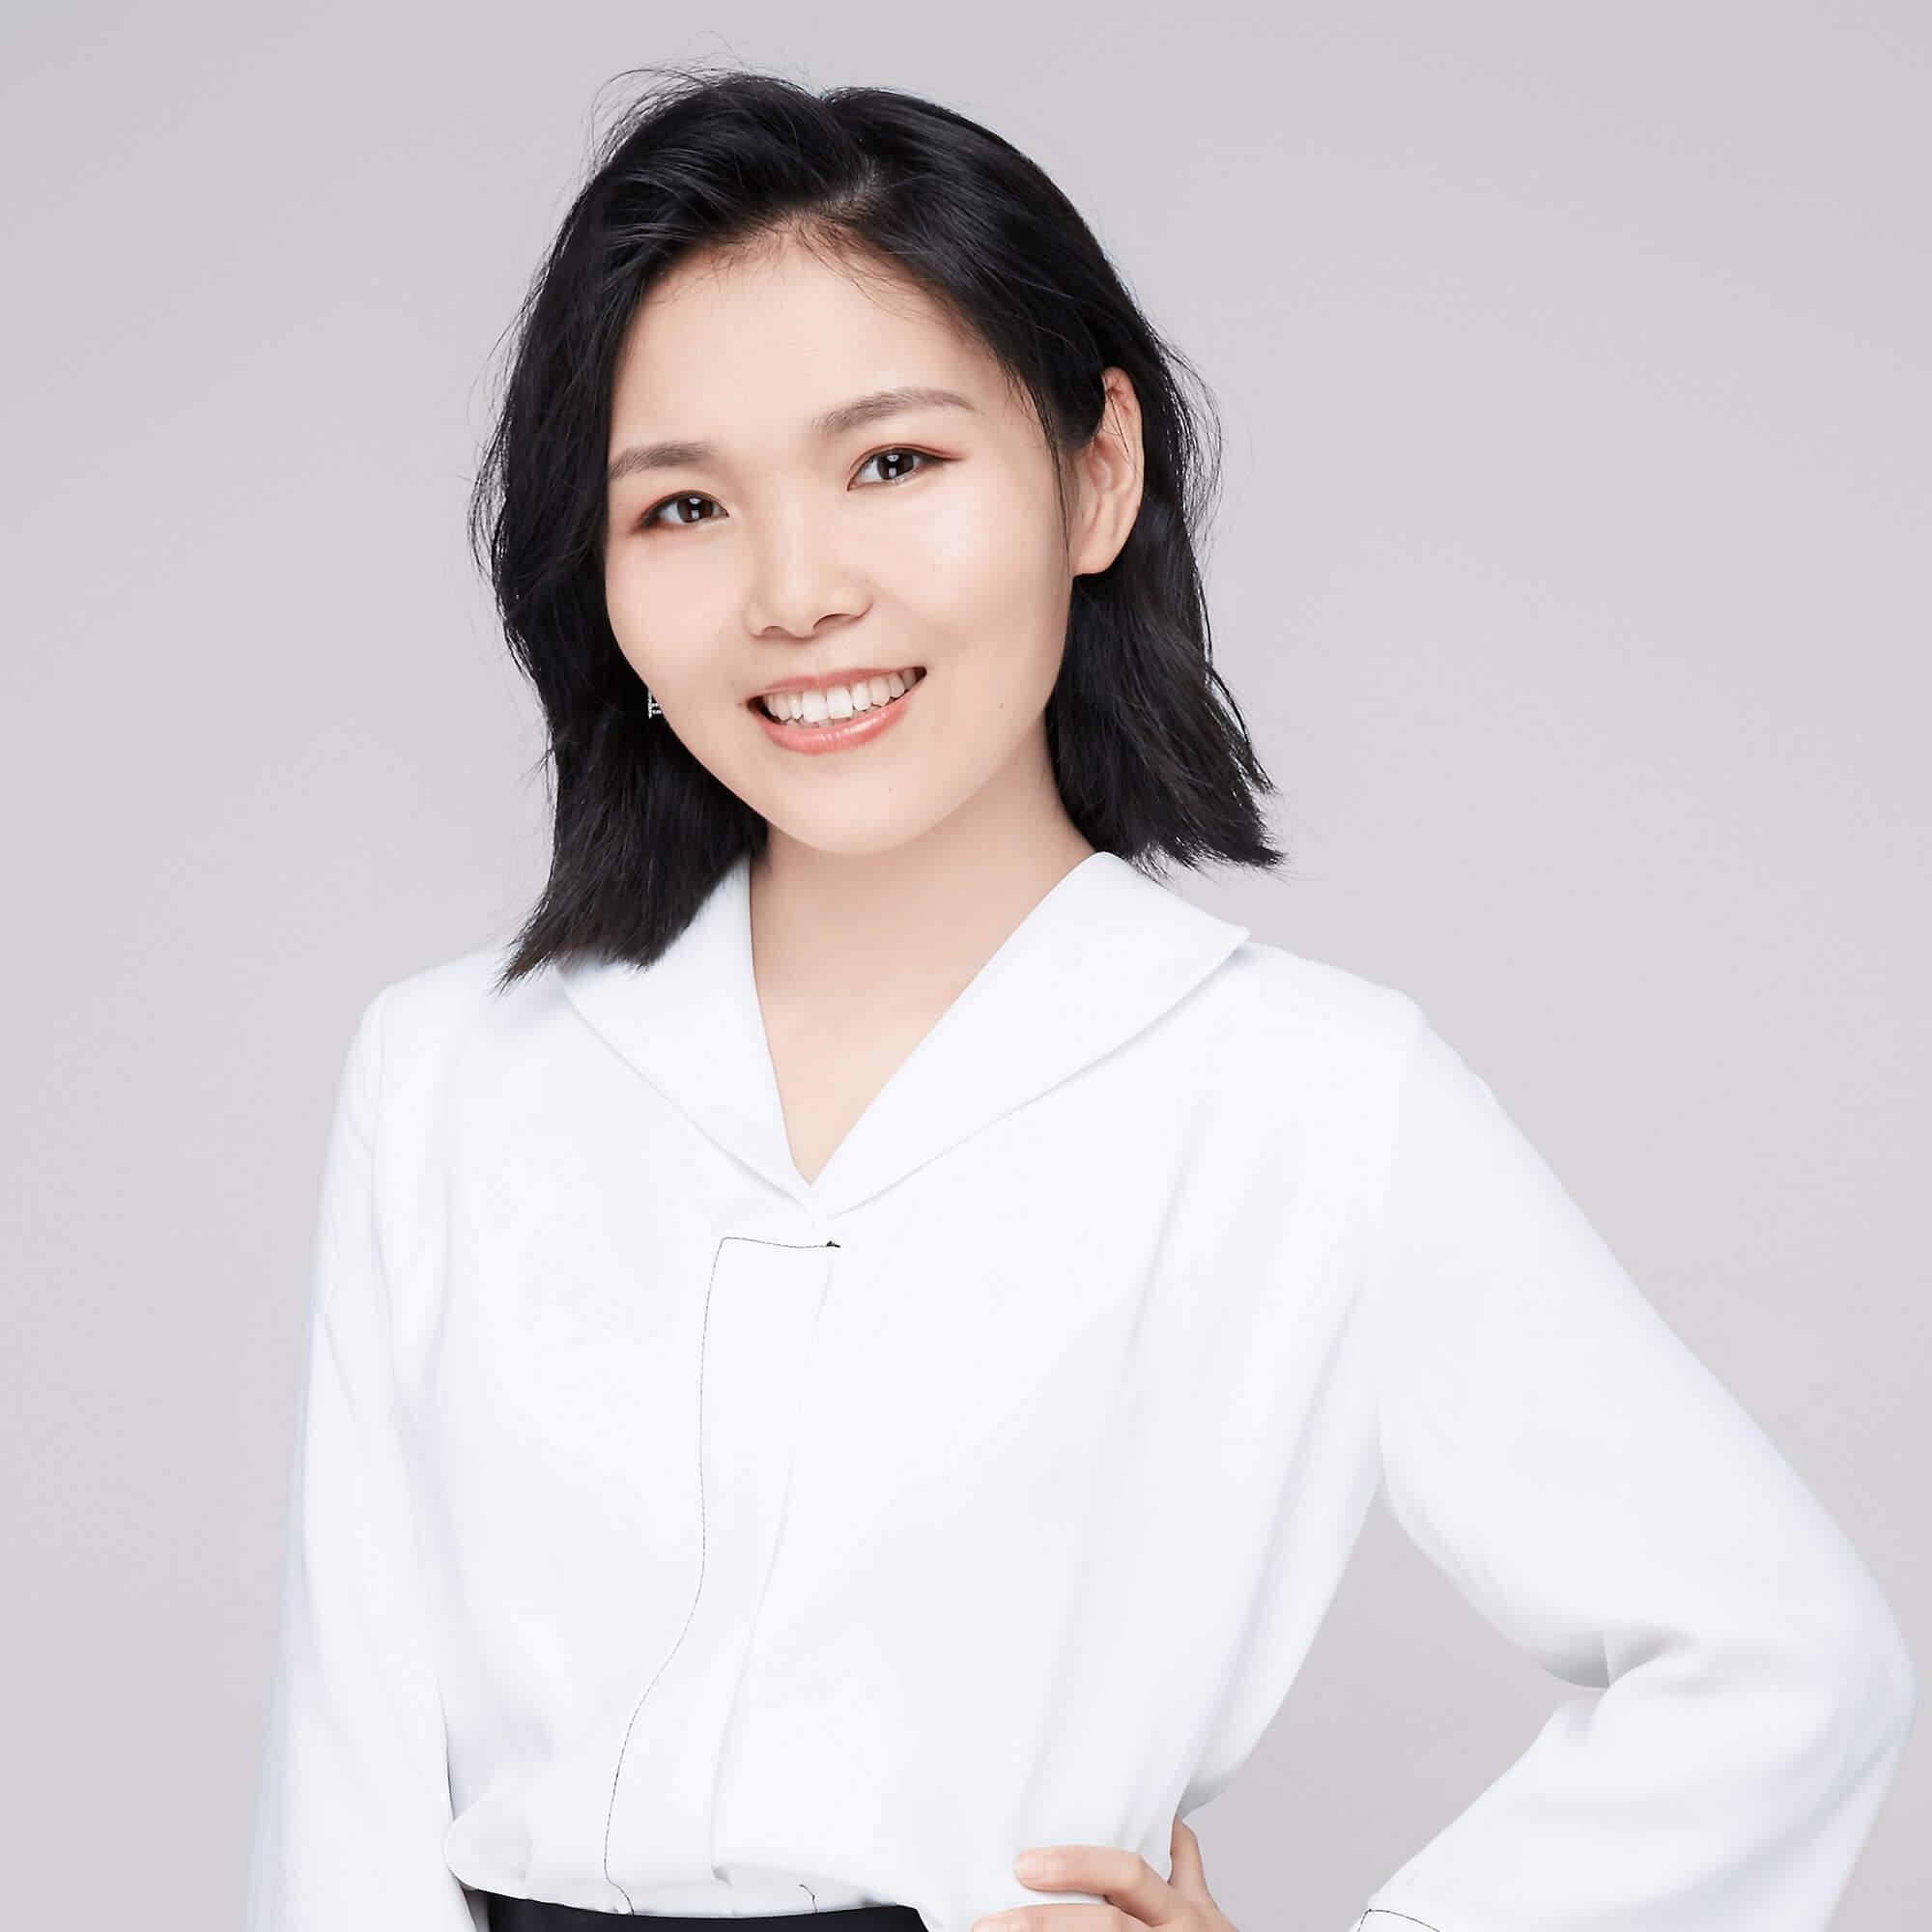 Linlin Hou